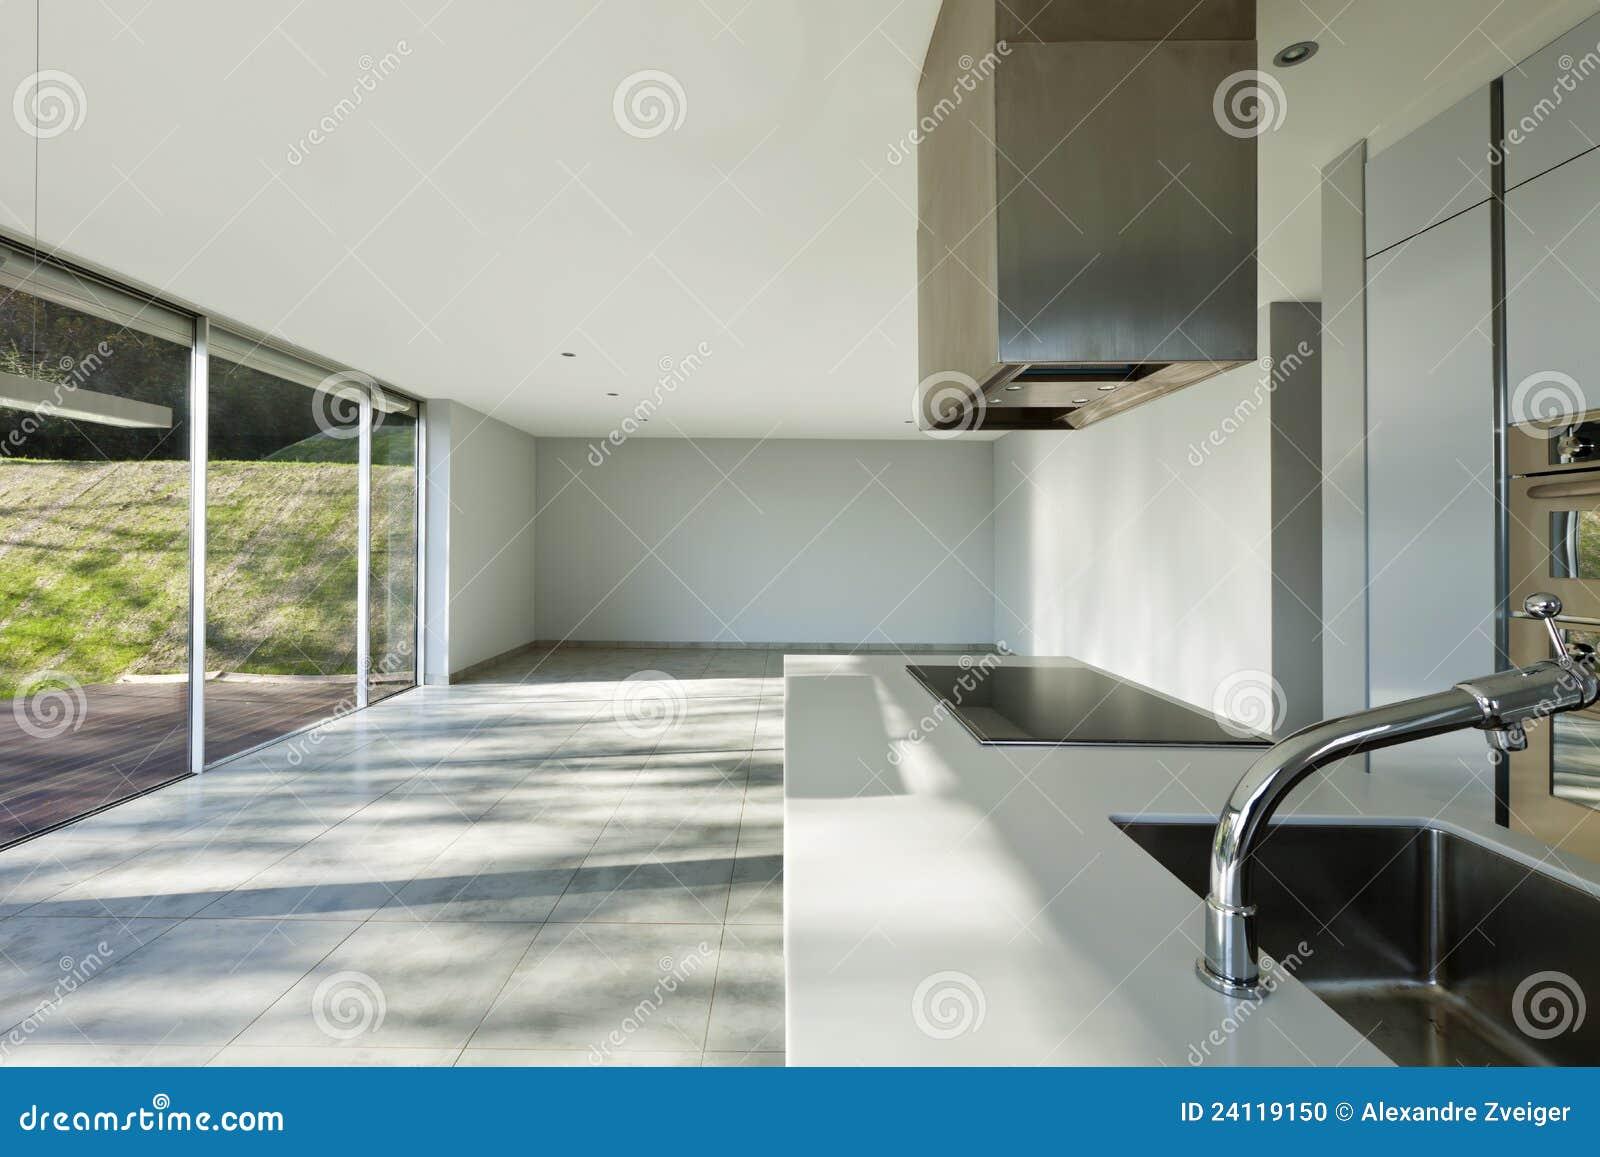 Moderne keuken in oud huis - Moderne keukenfotos ...